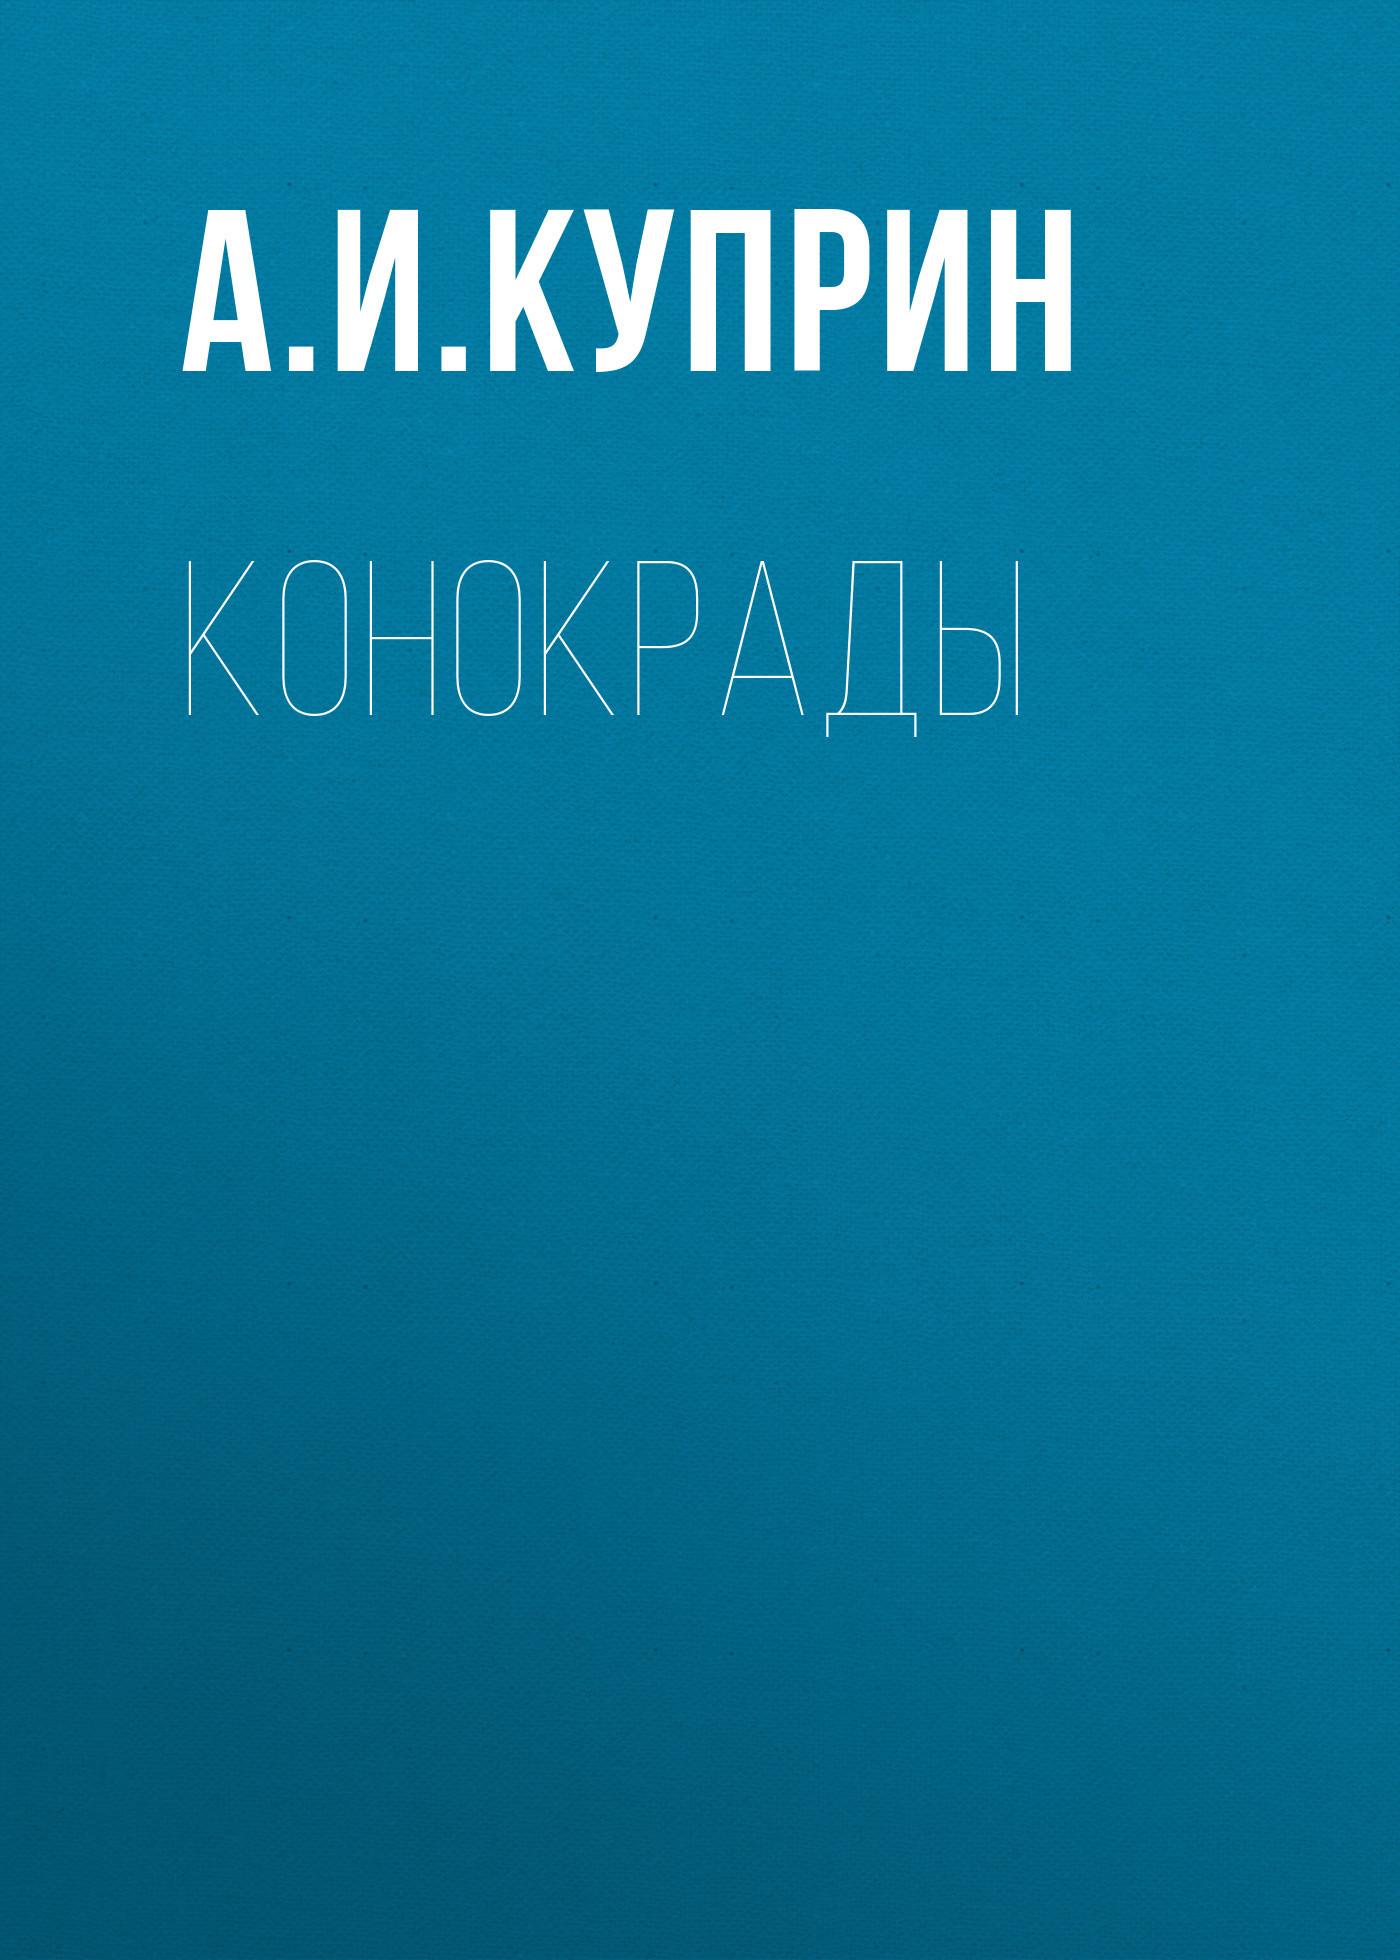 А. И. Куприн. Конокрады